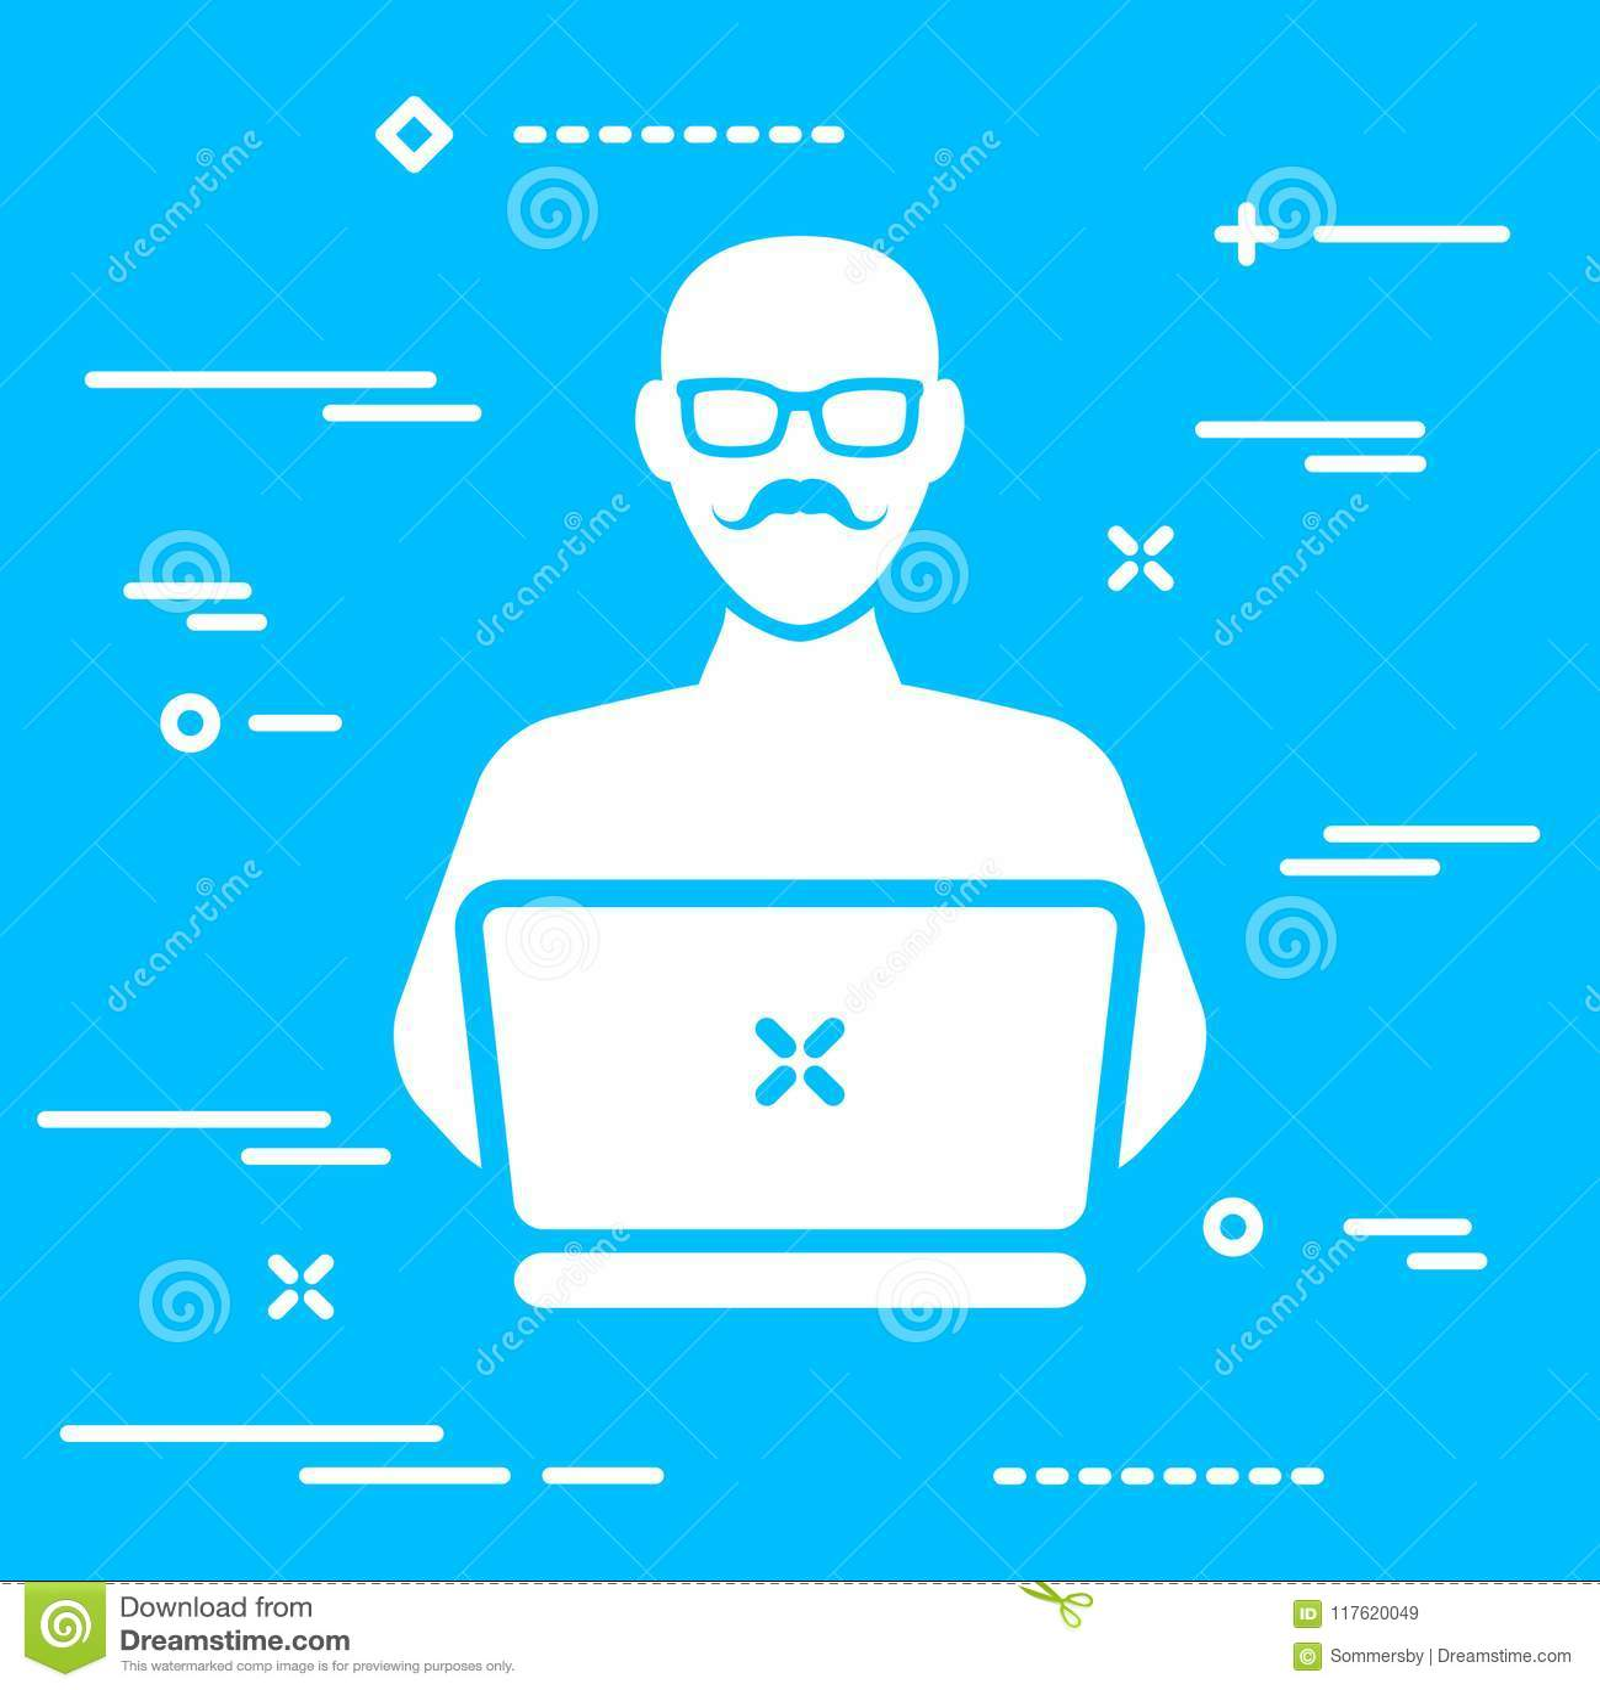 Download free advertising billing software br softech blog.